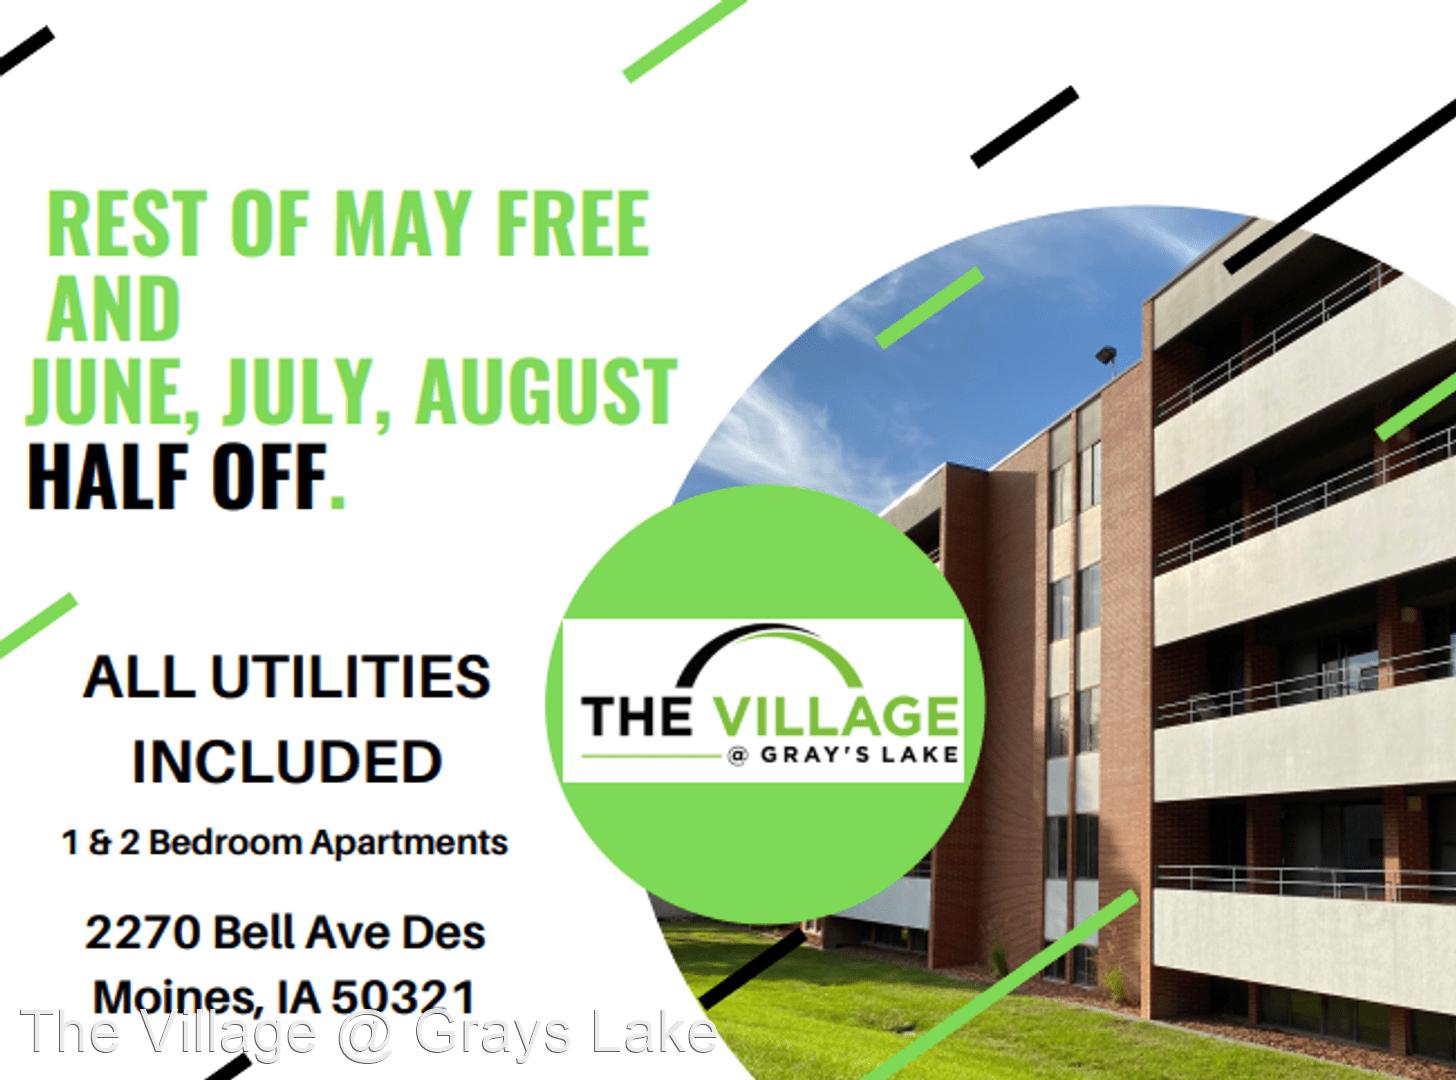 Apartments Near Vatterott College-Des Moines The Village @ Grays Lake for Vatterott College-Des Moines Students in Des Moines, IA